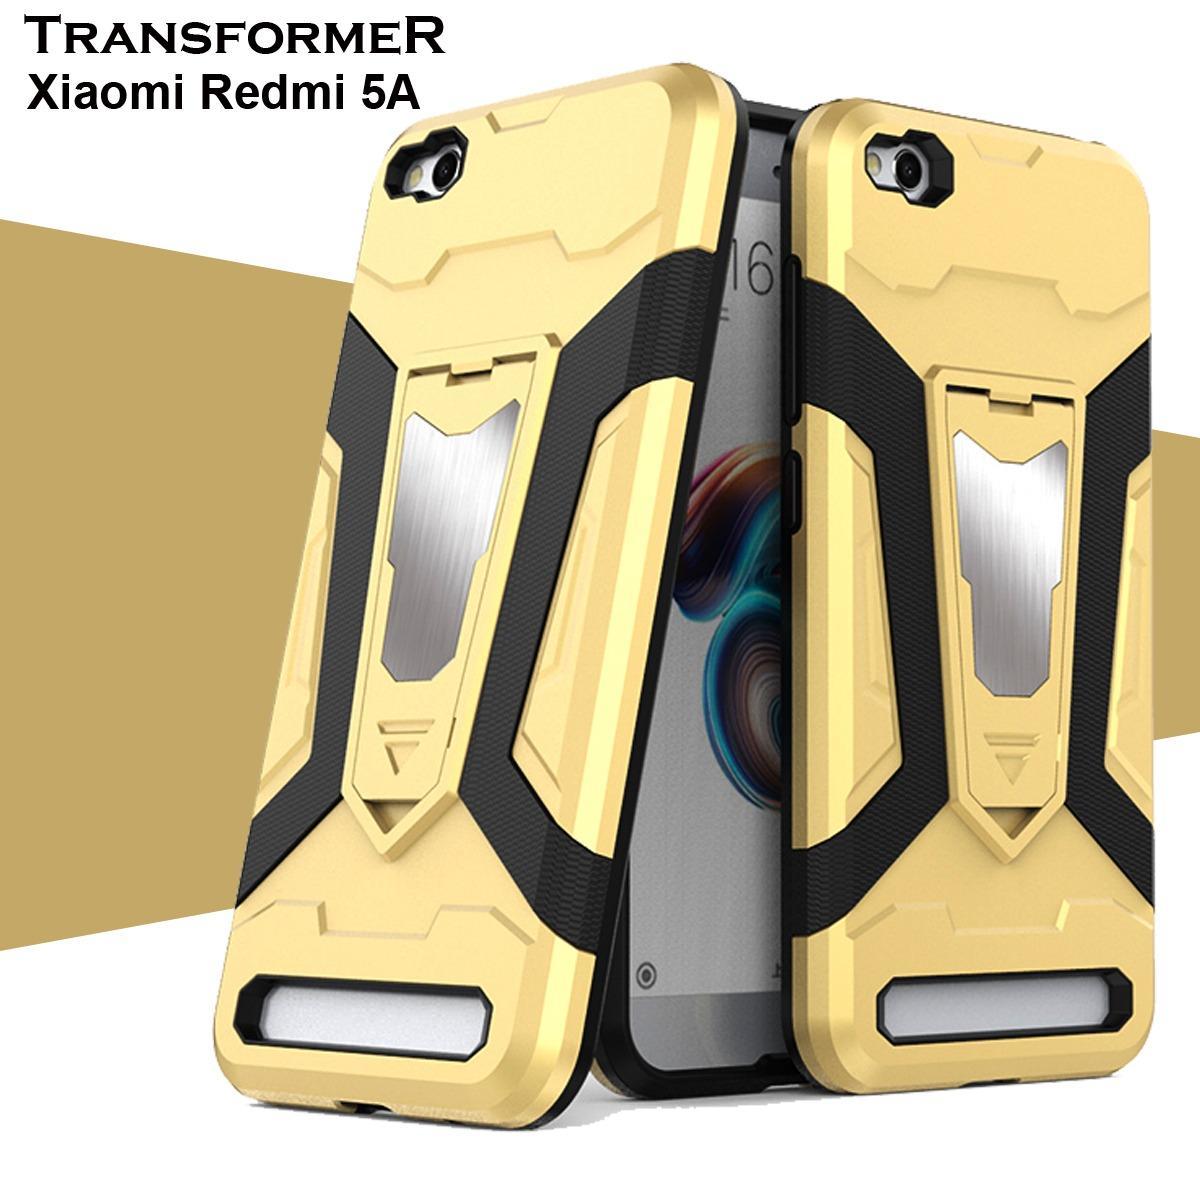 ... Case Iron Man for Xiaomi Redmi 5A REDMI 5A Robot Transformer Ironman Limited